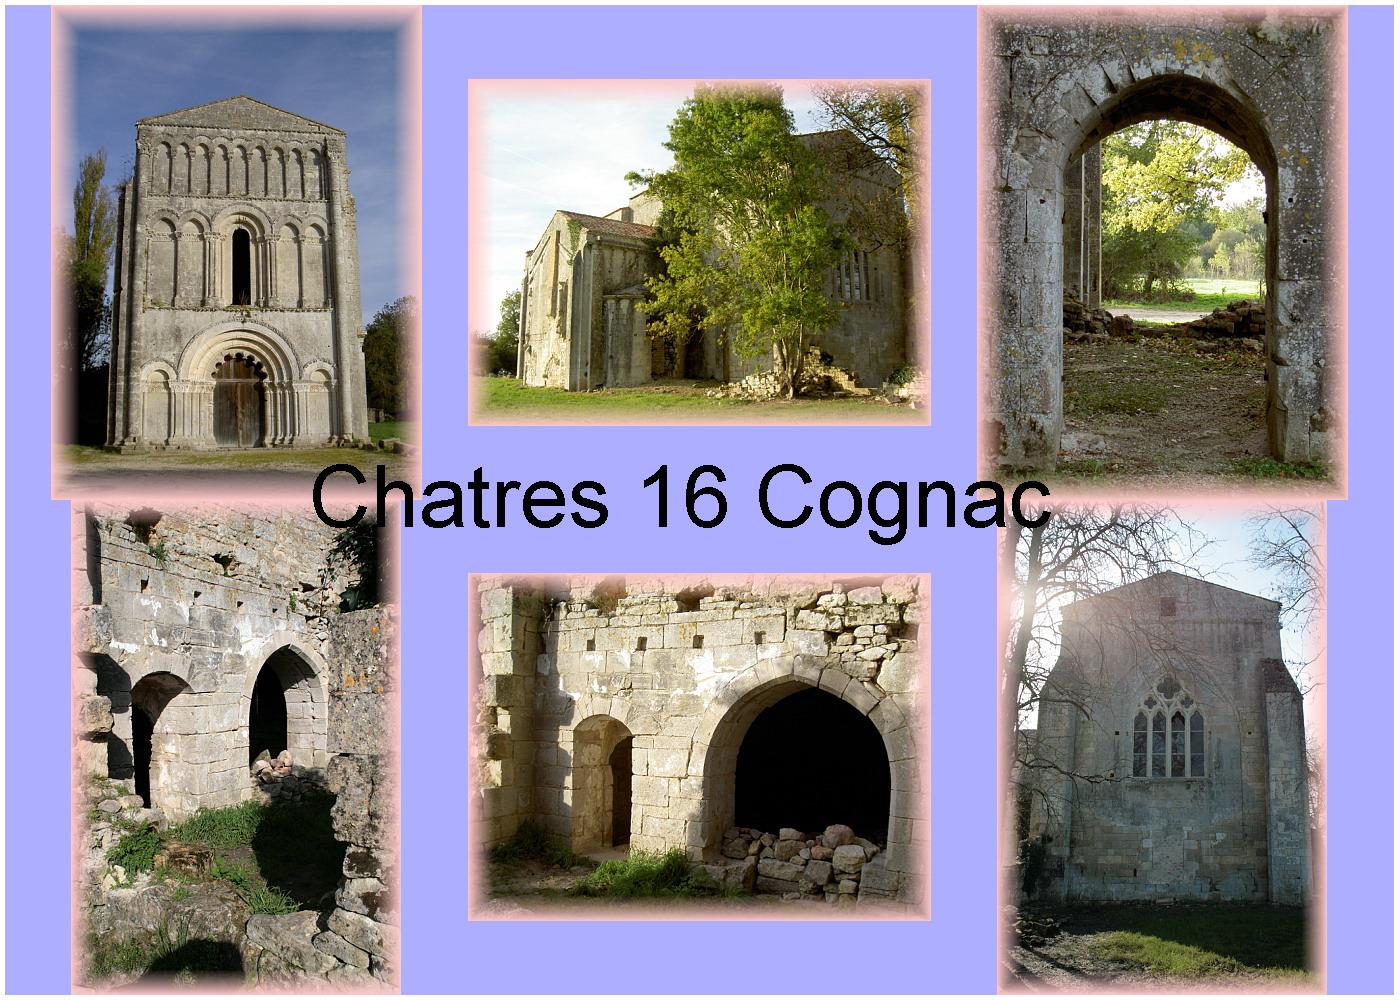 carte charente - 16 cog cognac chatres